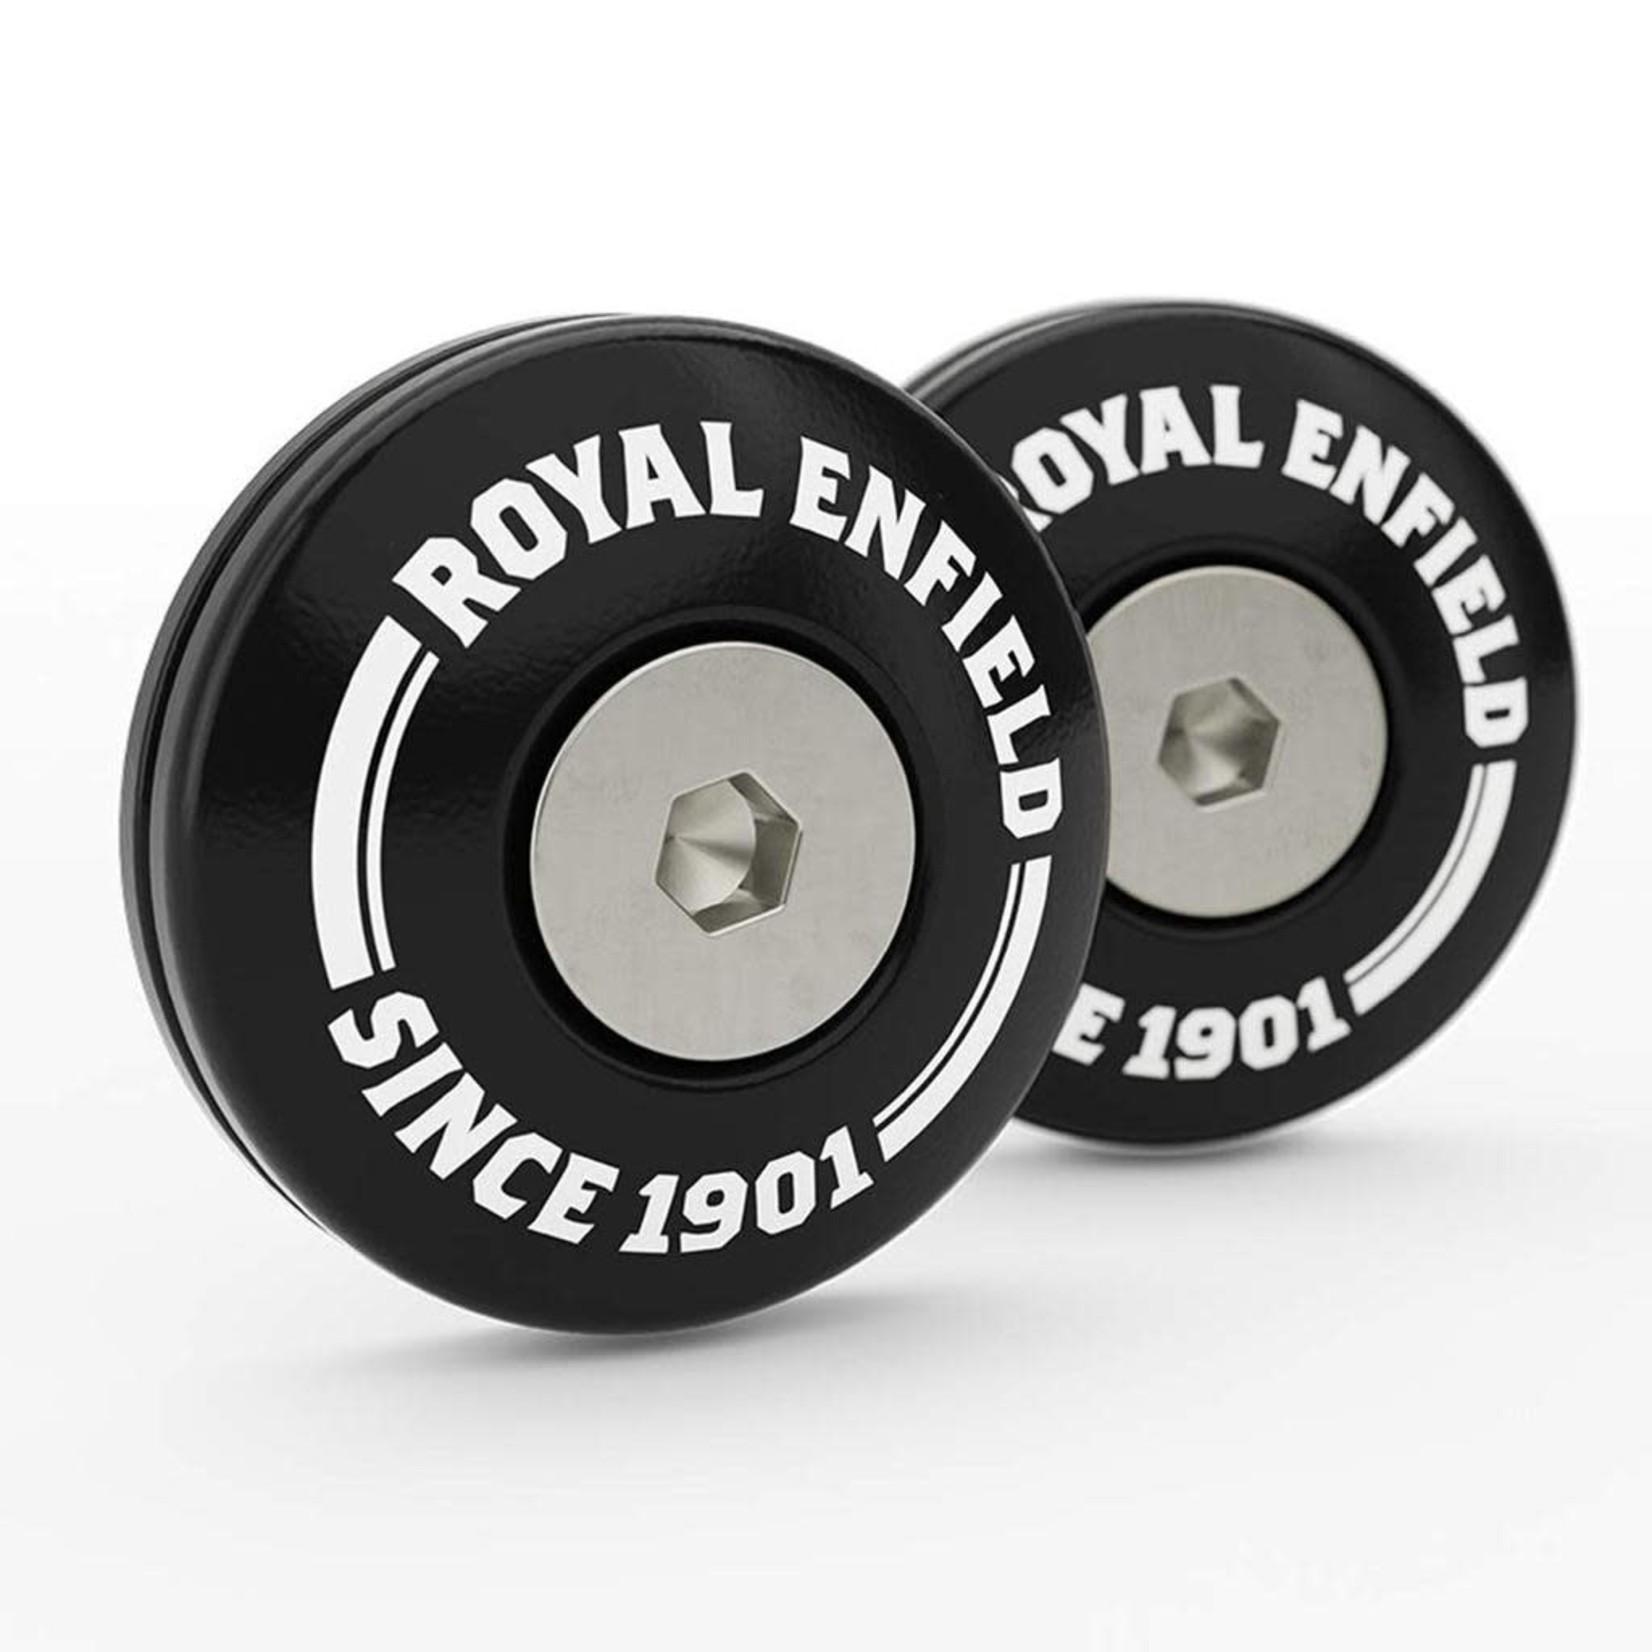 Royal Enfield bar end finisher kit, machined black 1720058/B